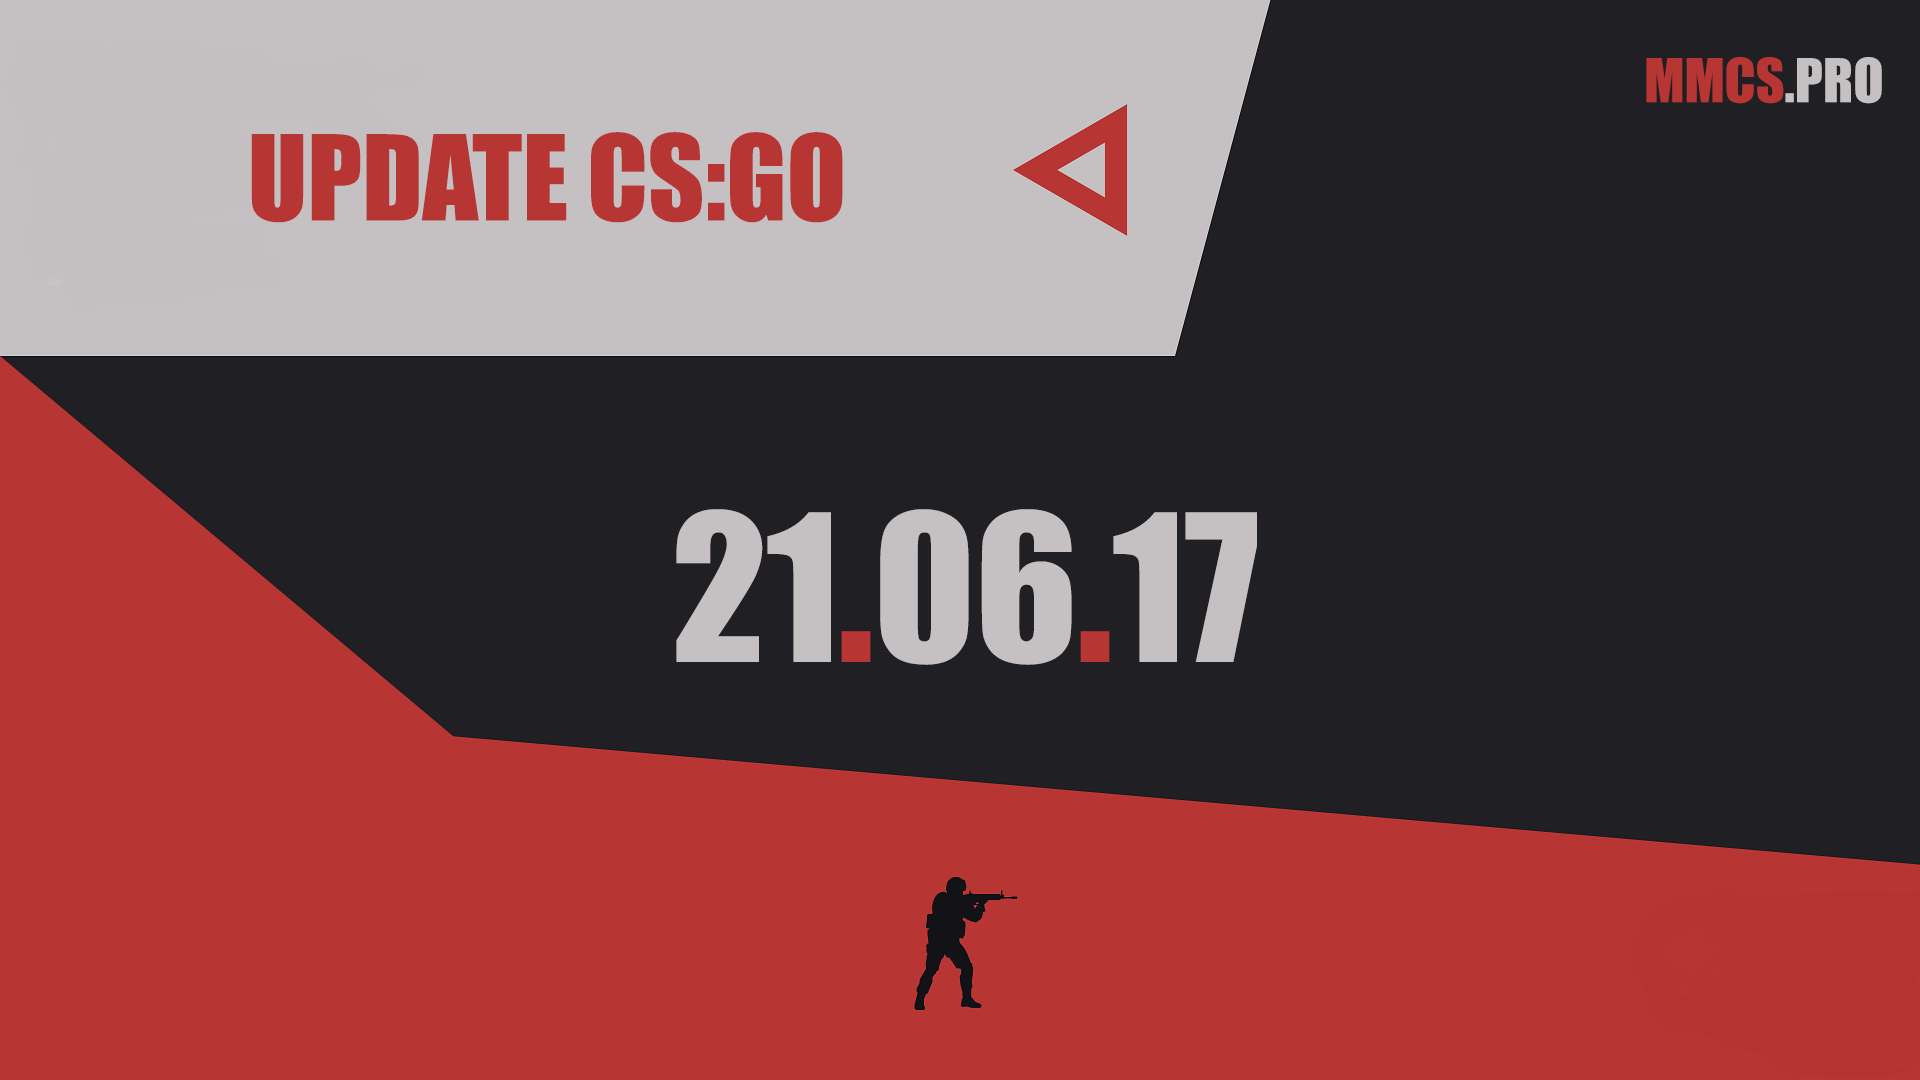 https://mmcs.pro/update-csgo-21-06-2017-valve/